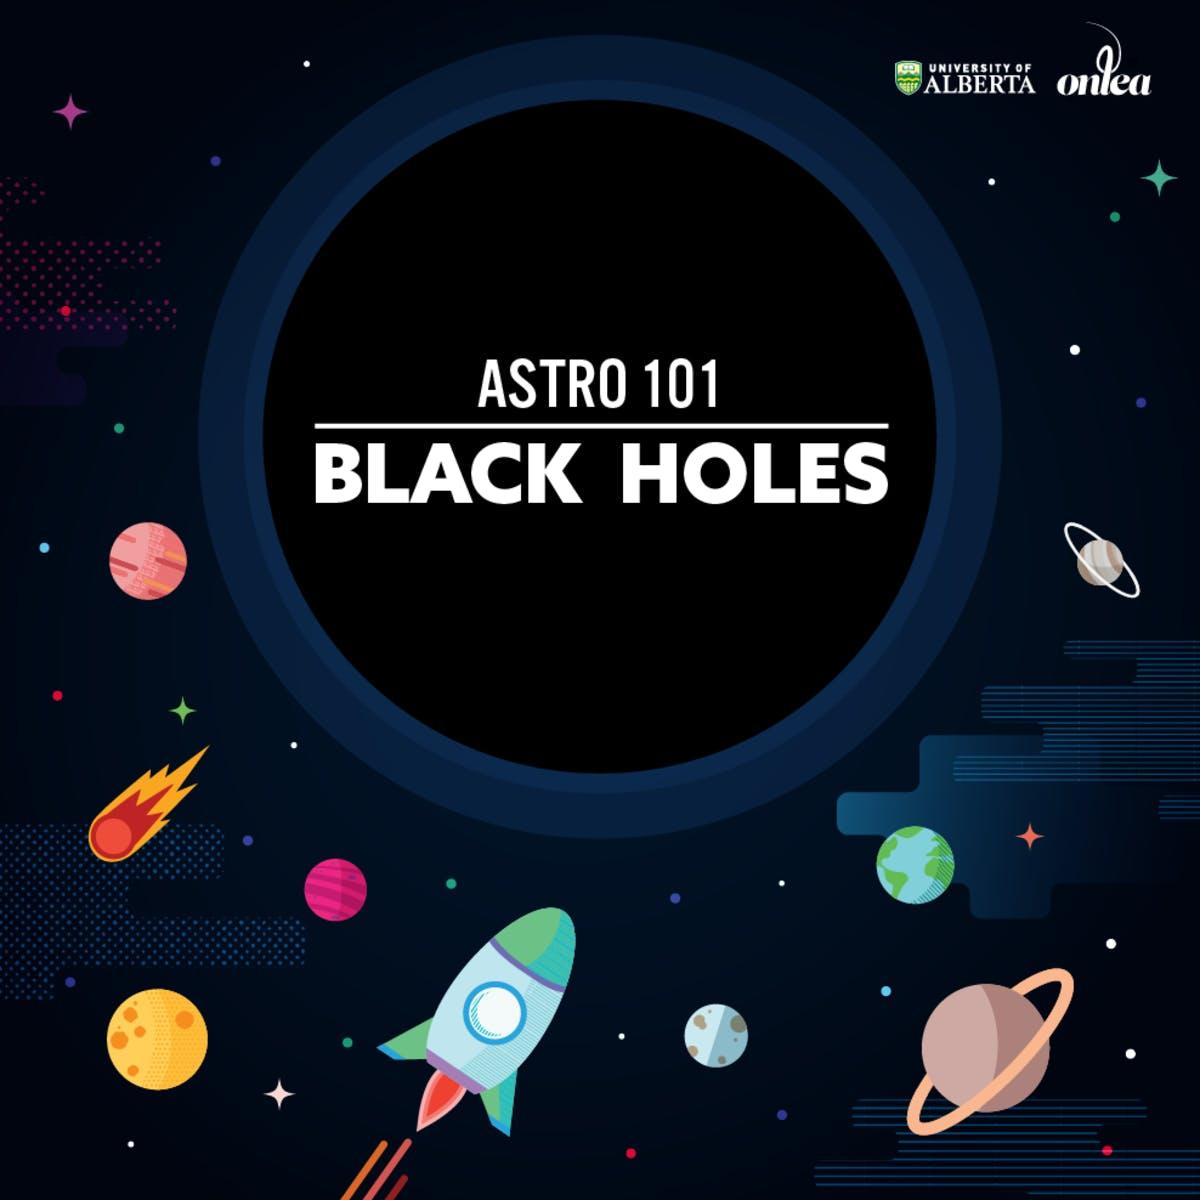 Astro 101: Black Holes